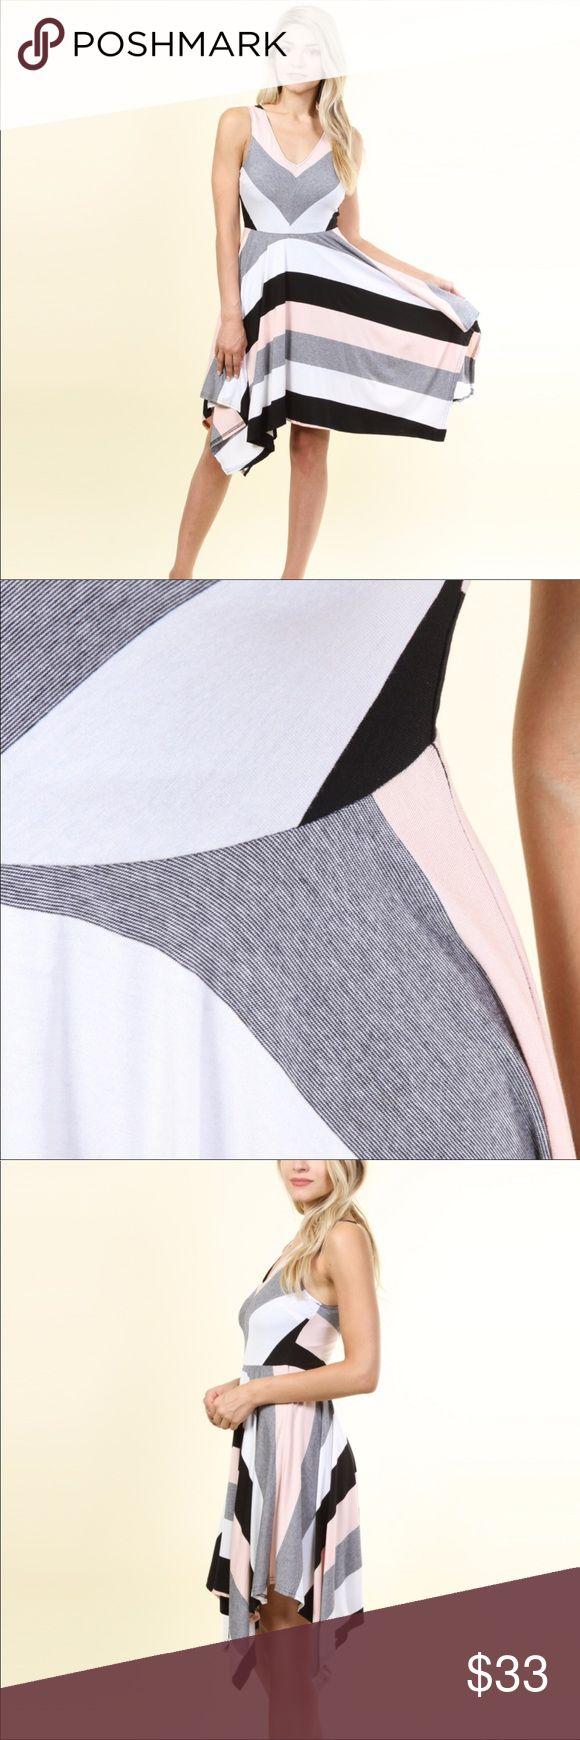 🆕 Multi color striper fit n flare dress!!👗👗👗 Fit n flare dress with asymmetrical hem. Stunningly Gorgeoussss 😍😍😍 Dresses Midi